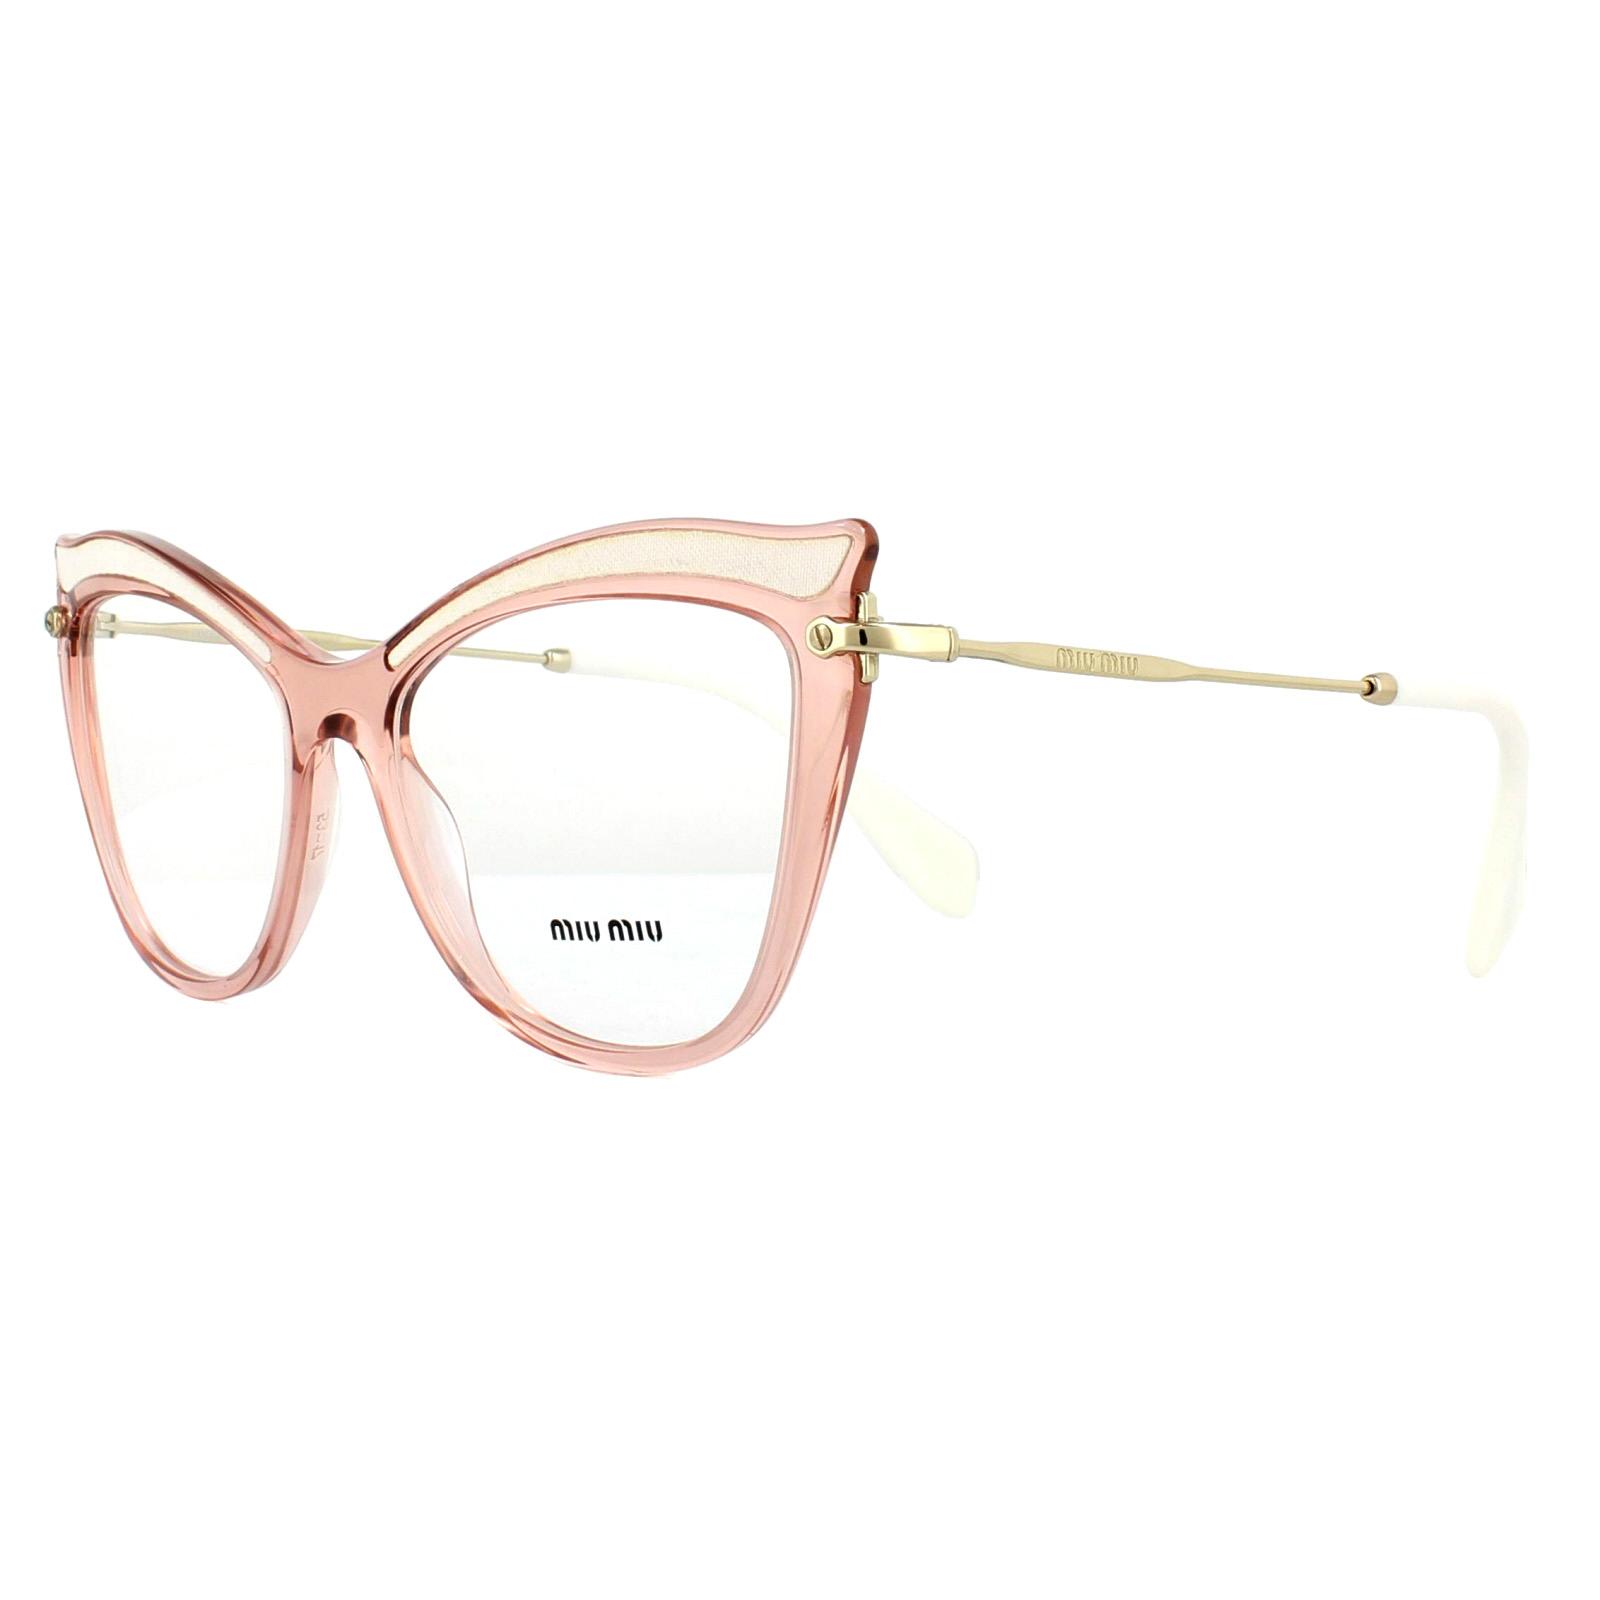 3a54ed708d88 Sentinel Miu Miu Glasses Frames MU06PV VH01O1 Transparent Pink 53mm Womens